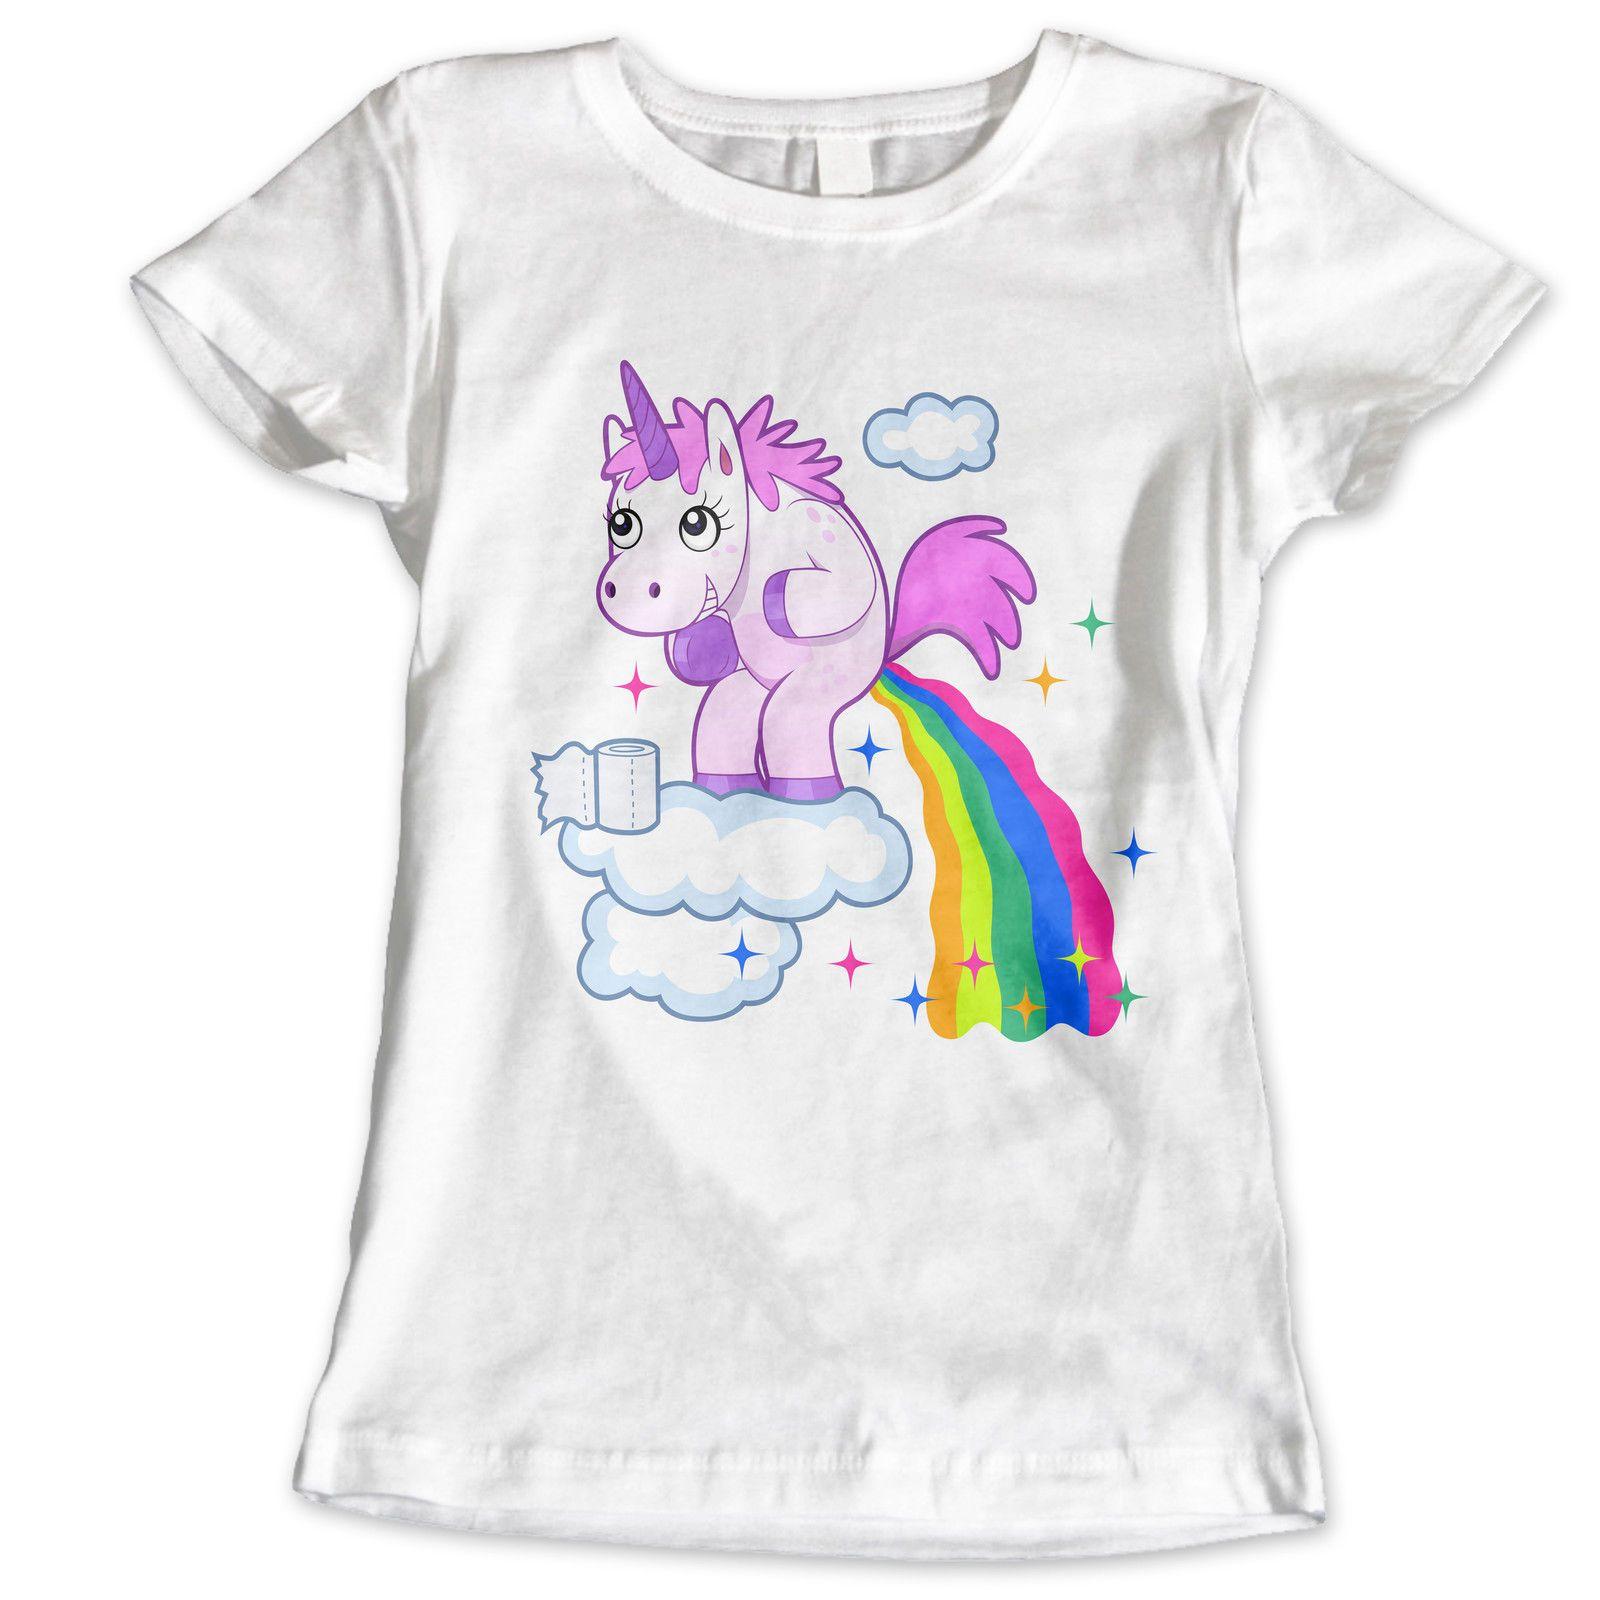 4d7f8a1ce190c Women s Tee Girls Womans Unicorn Celebrity Girly Princess Tumblr Fashion  Paris T Shirt Womens Tops Fashion Design 100% Cotone T-shirt S - Xl